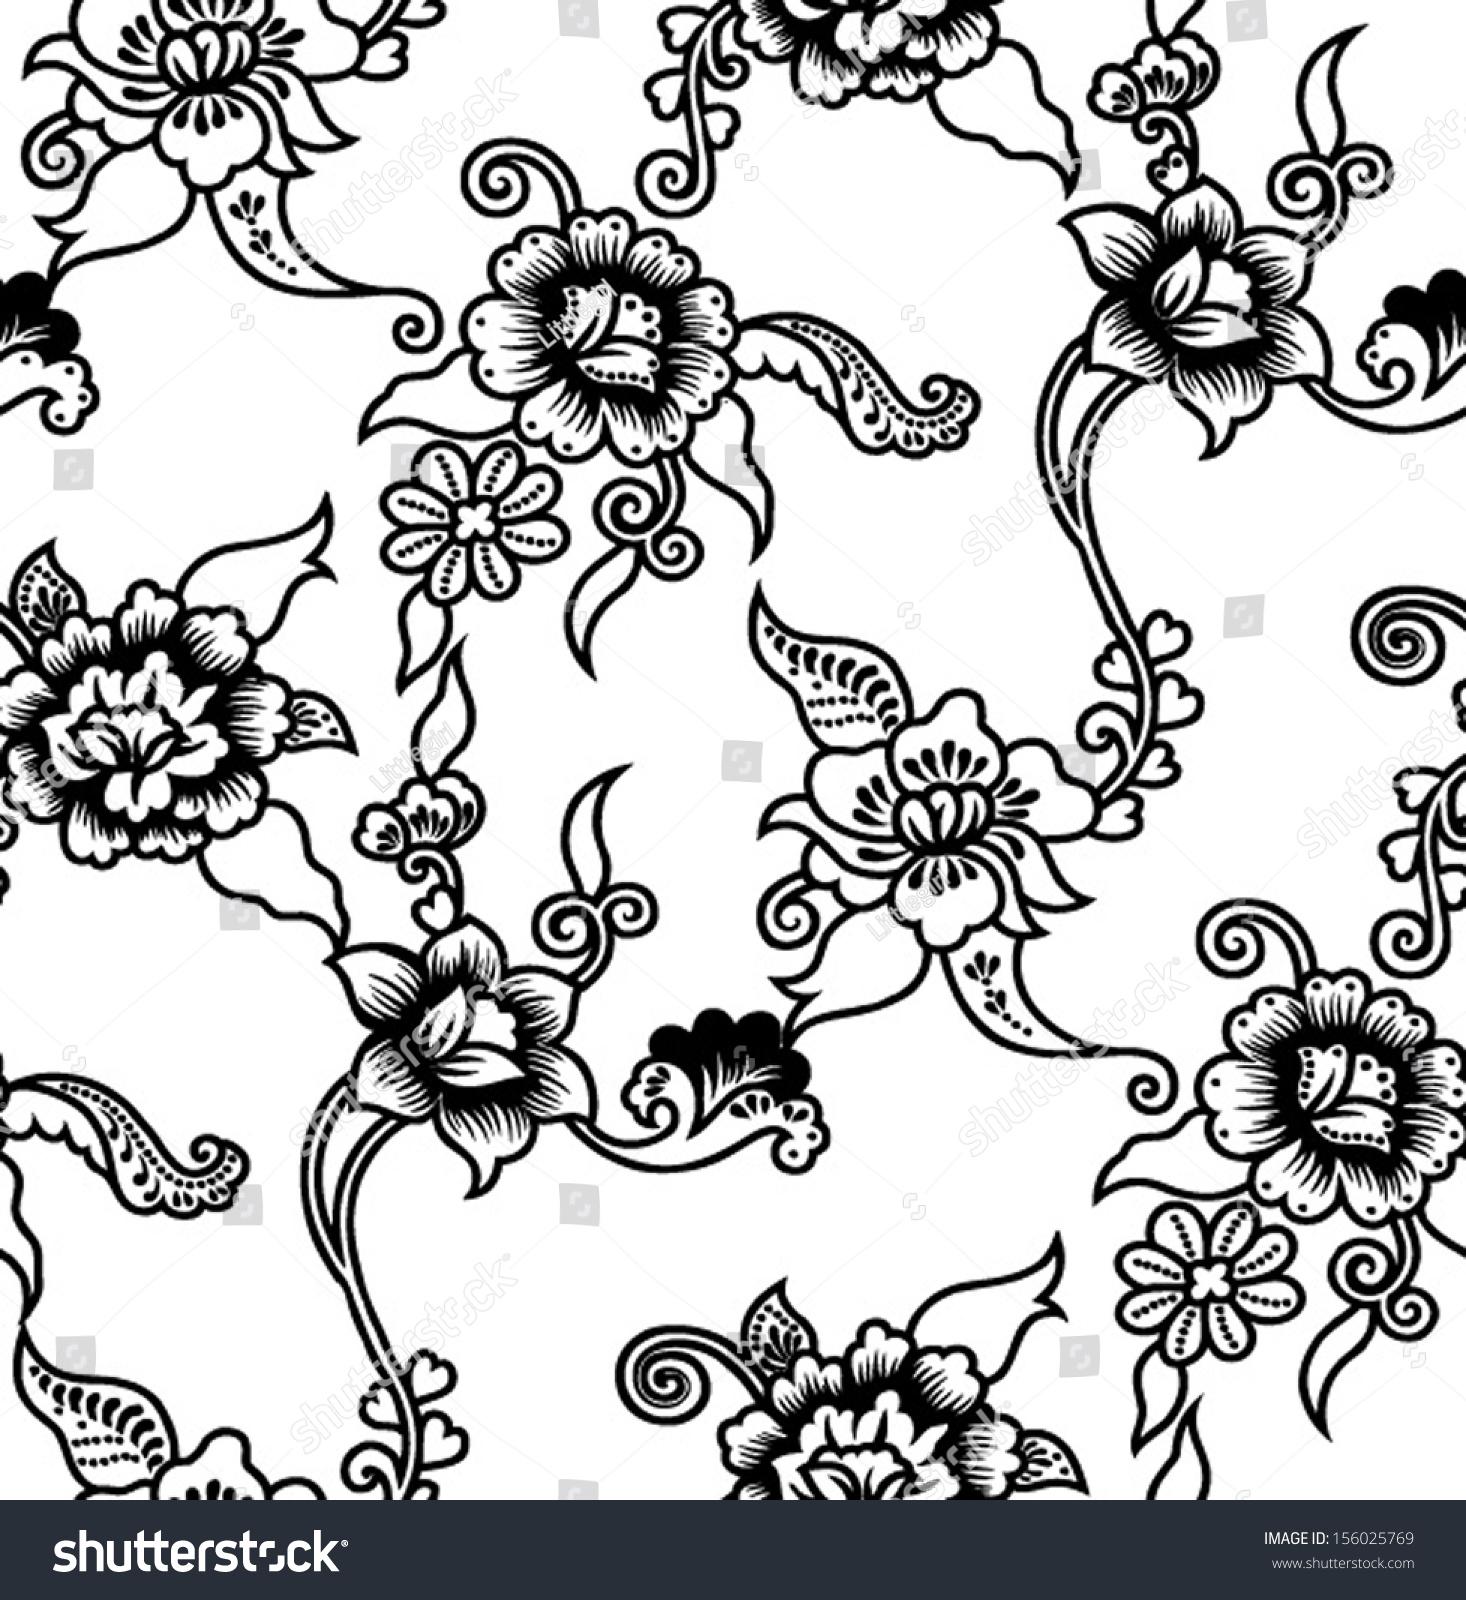 Seamless Batik Vector Floral Background.